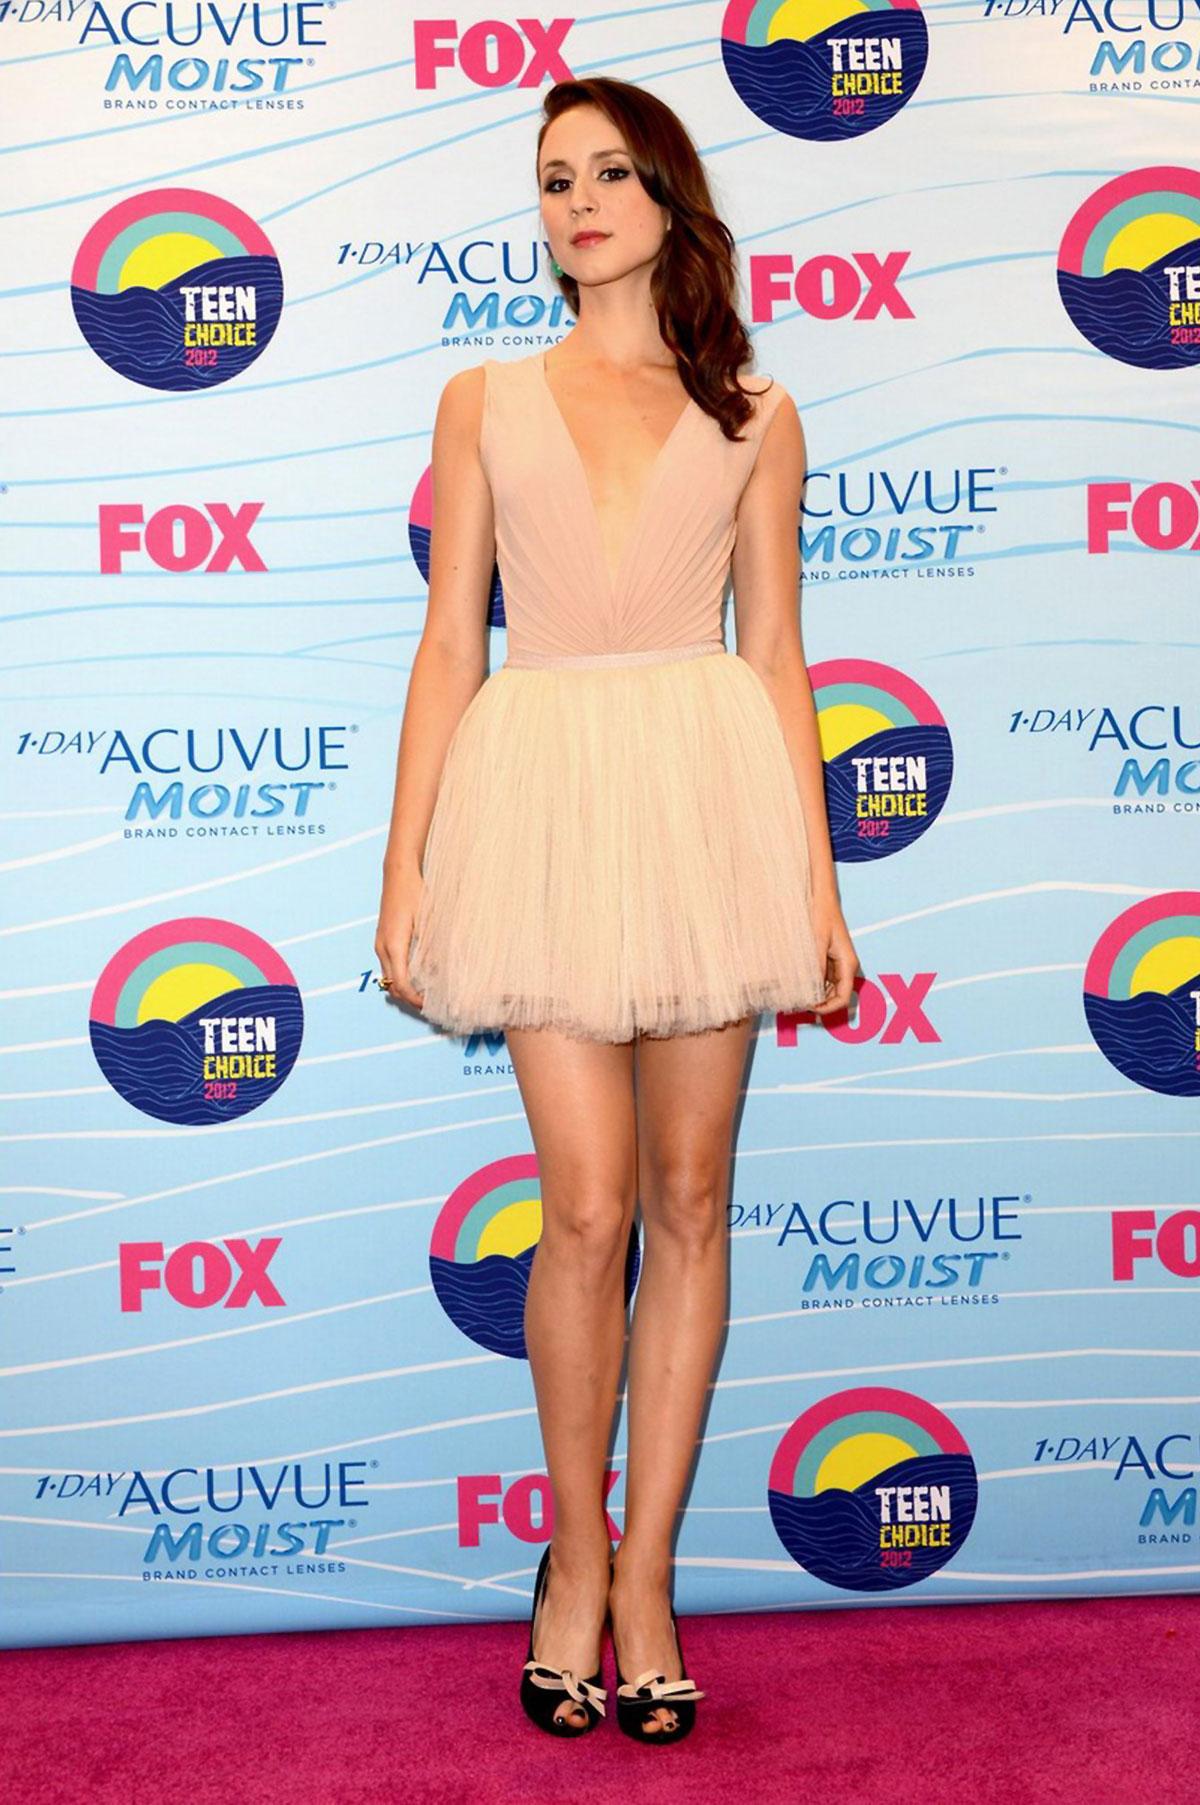 TROIAN BELLISARIO At 2012 Teen Choice Awards In Universal